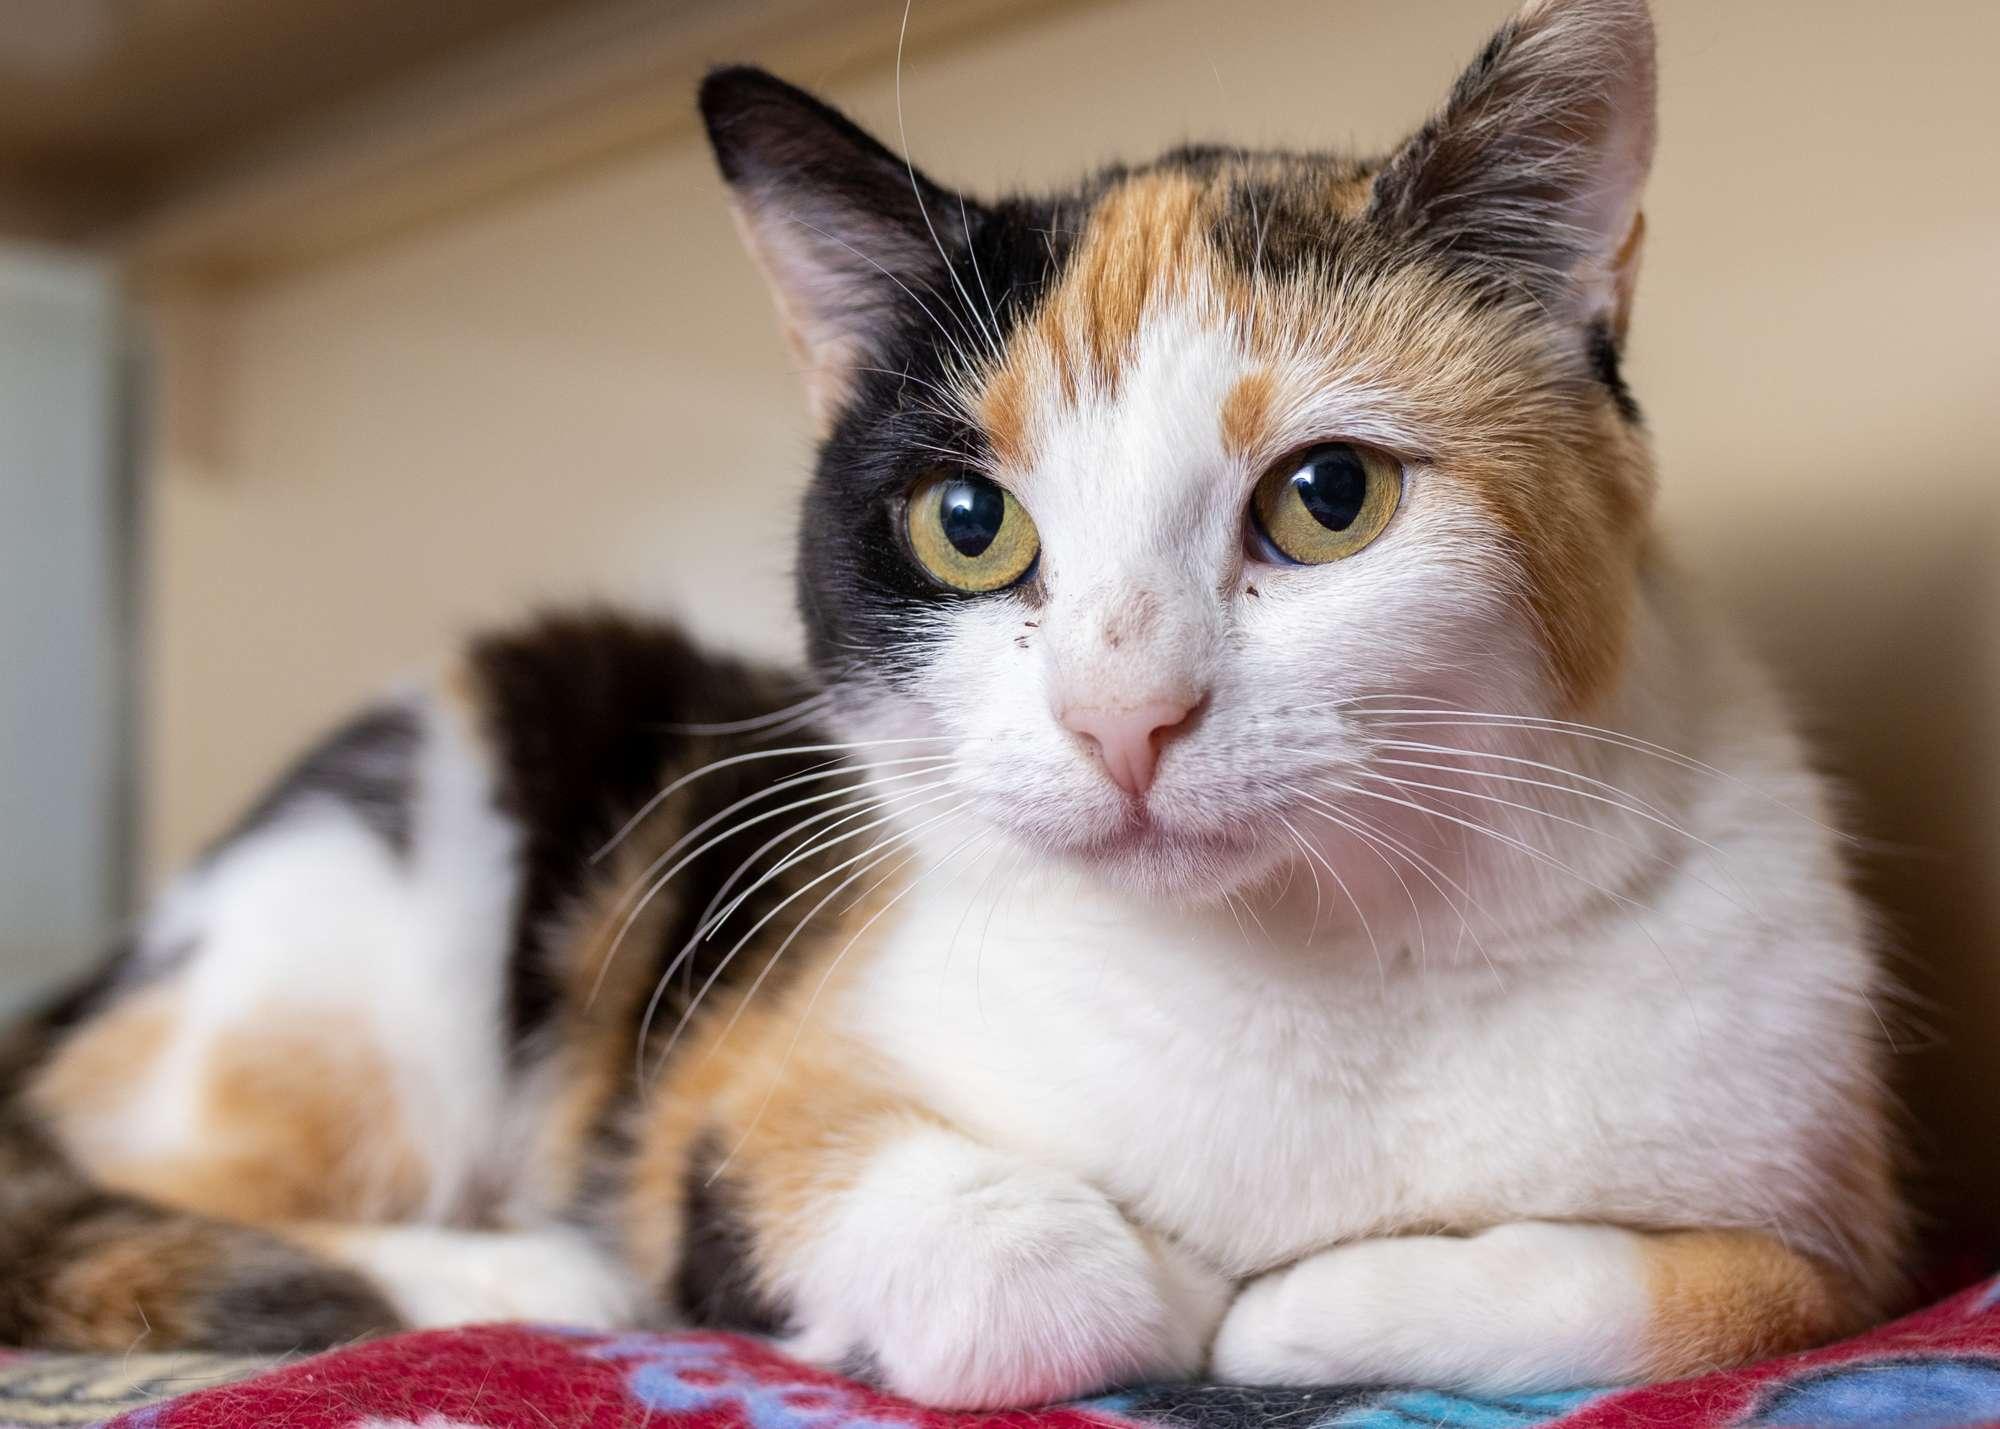 Zina - Furrr Feline Rescue - Cats & Kittens Available for Adoption